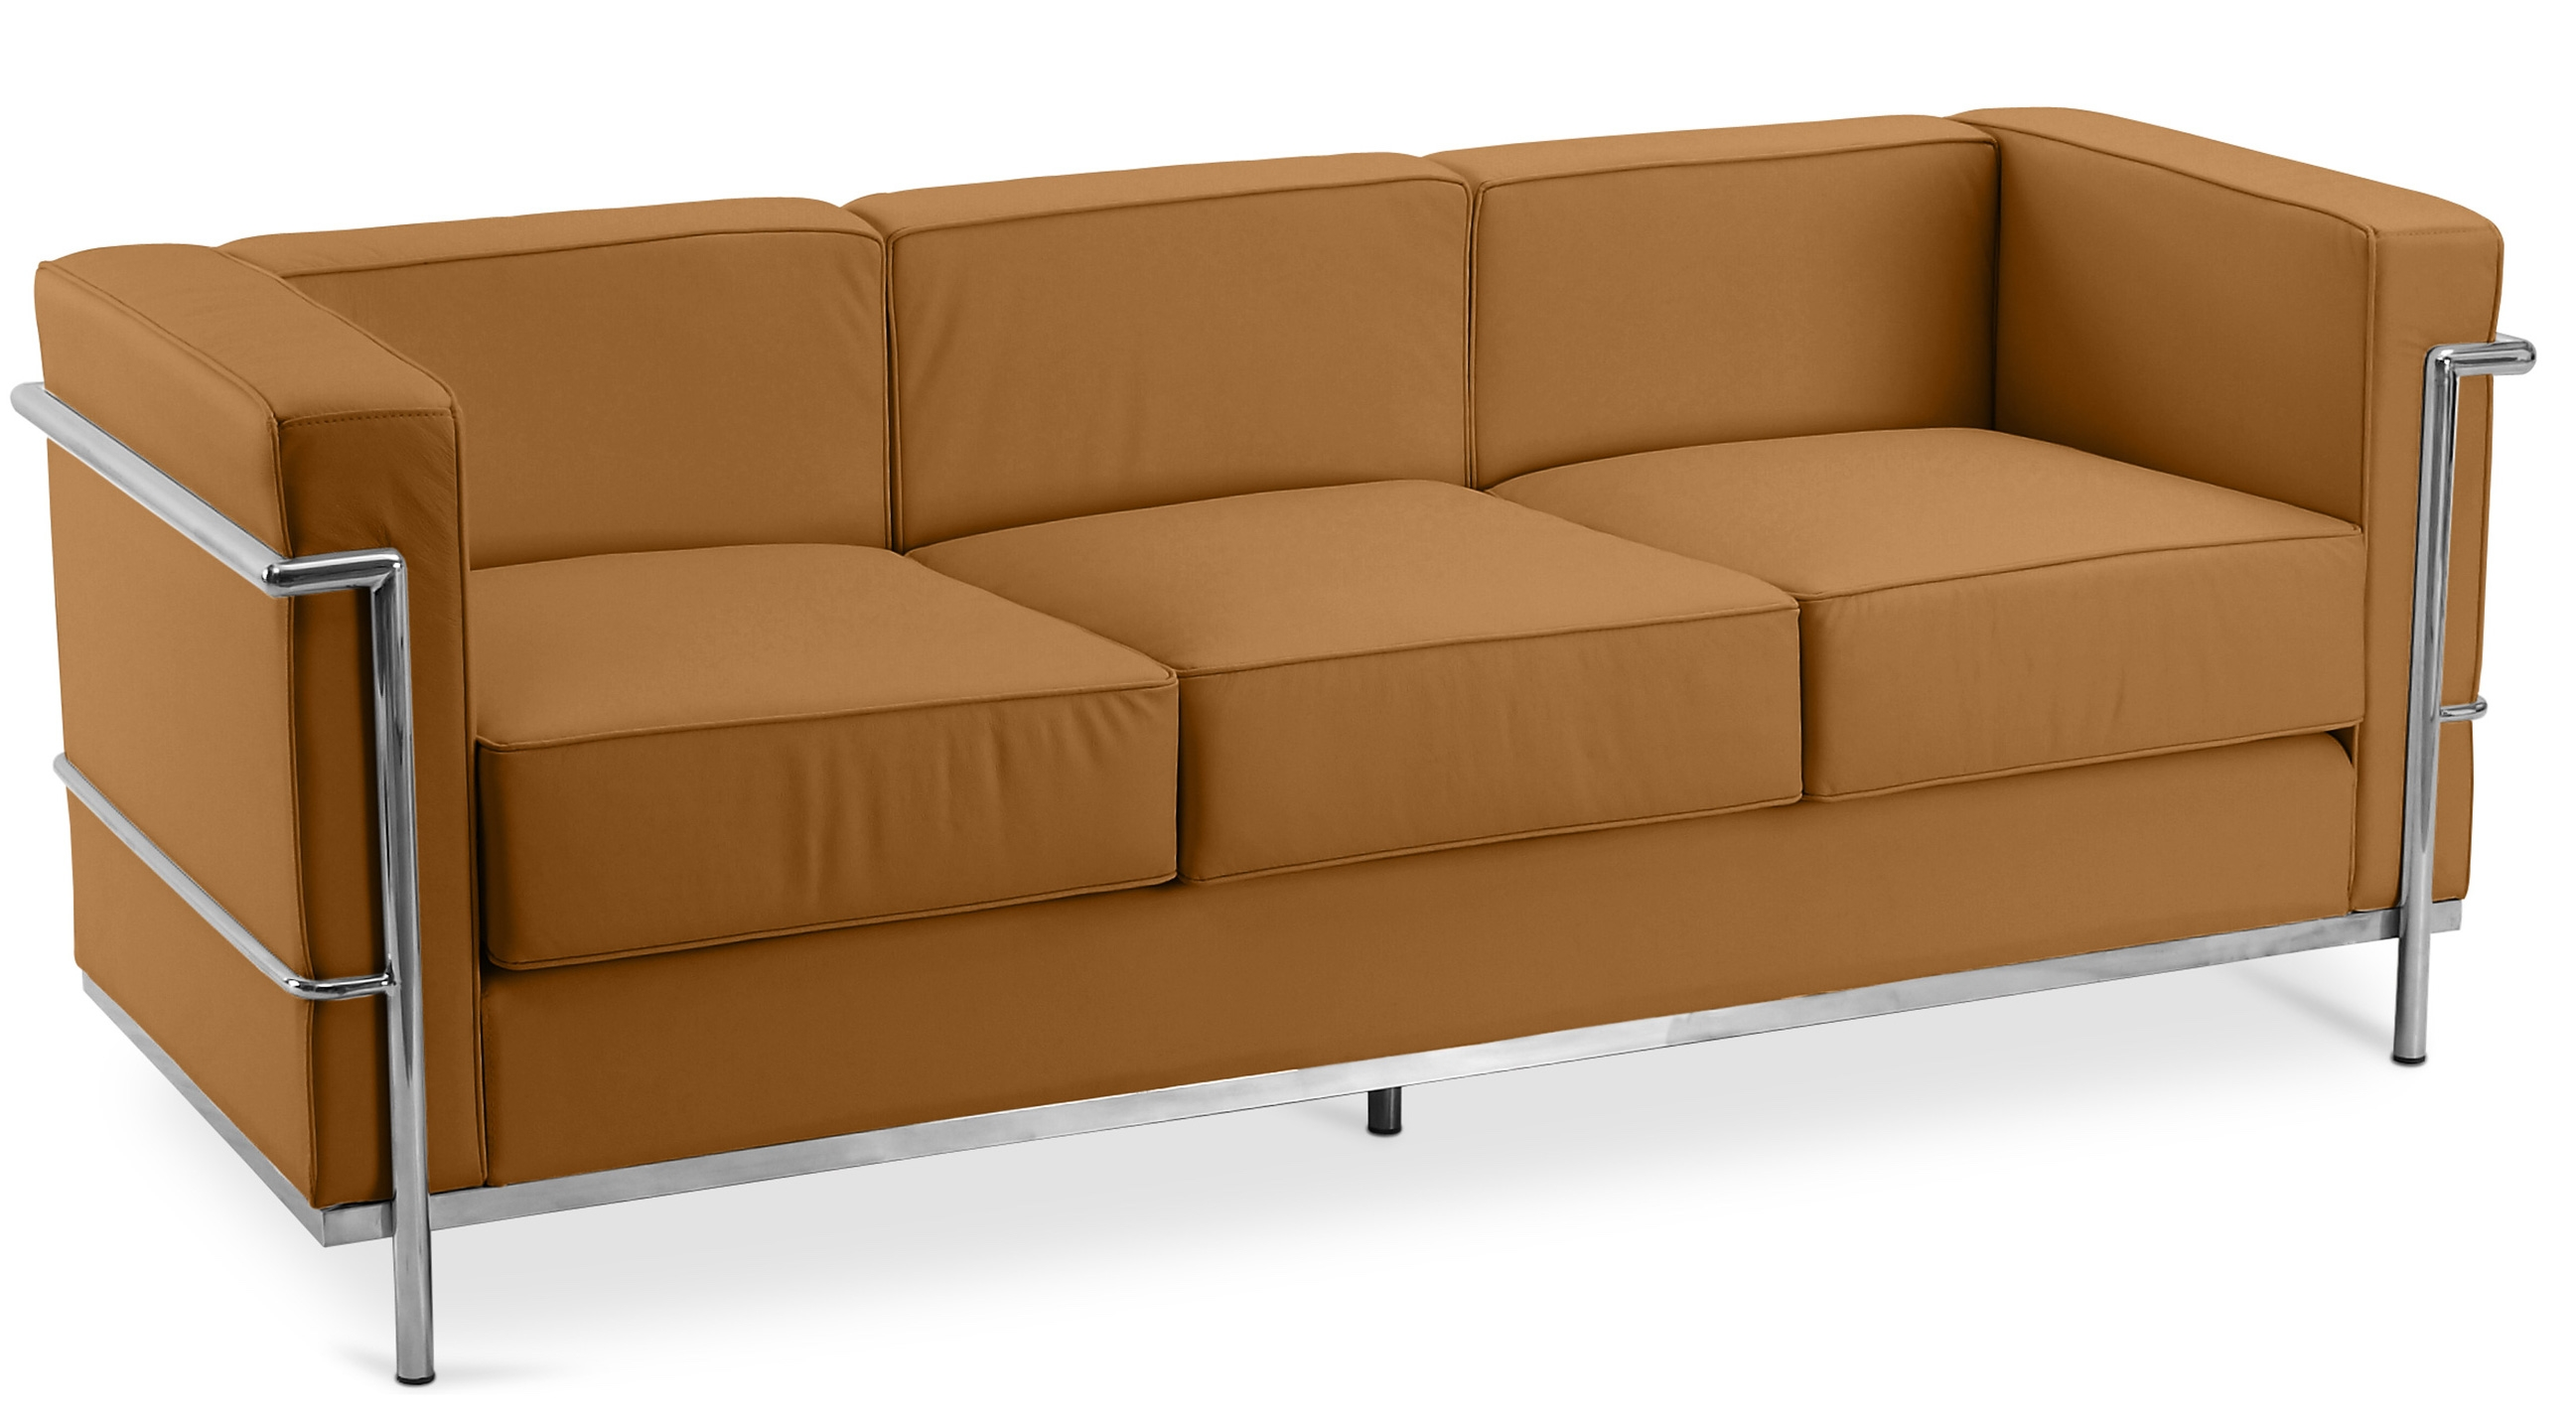 canap cuir camel 3 places inspir lc2. Black Bedroom Furniture Sets. Home Design Ideas